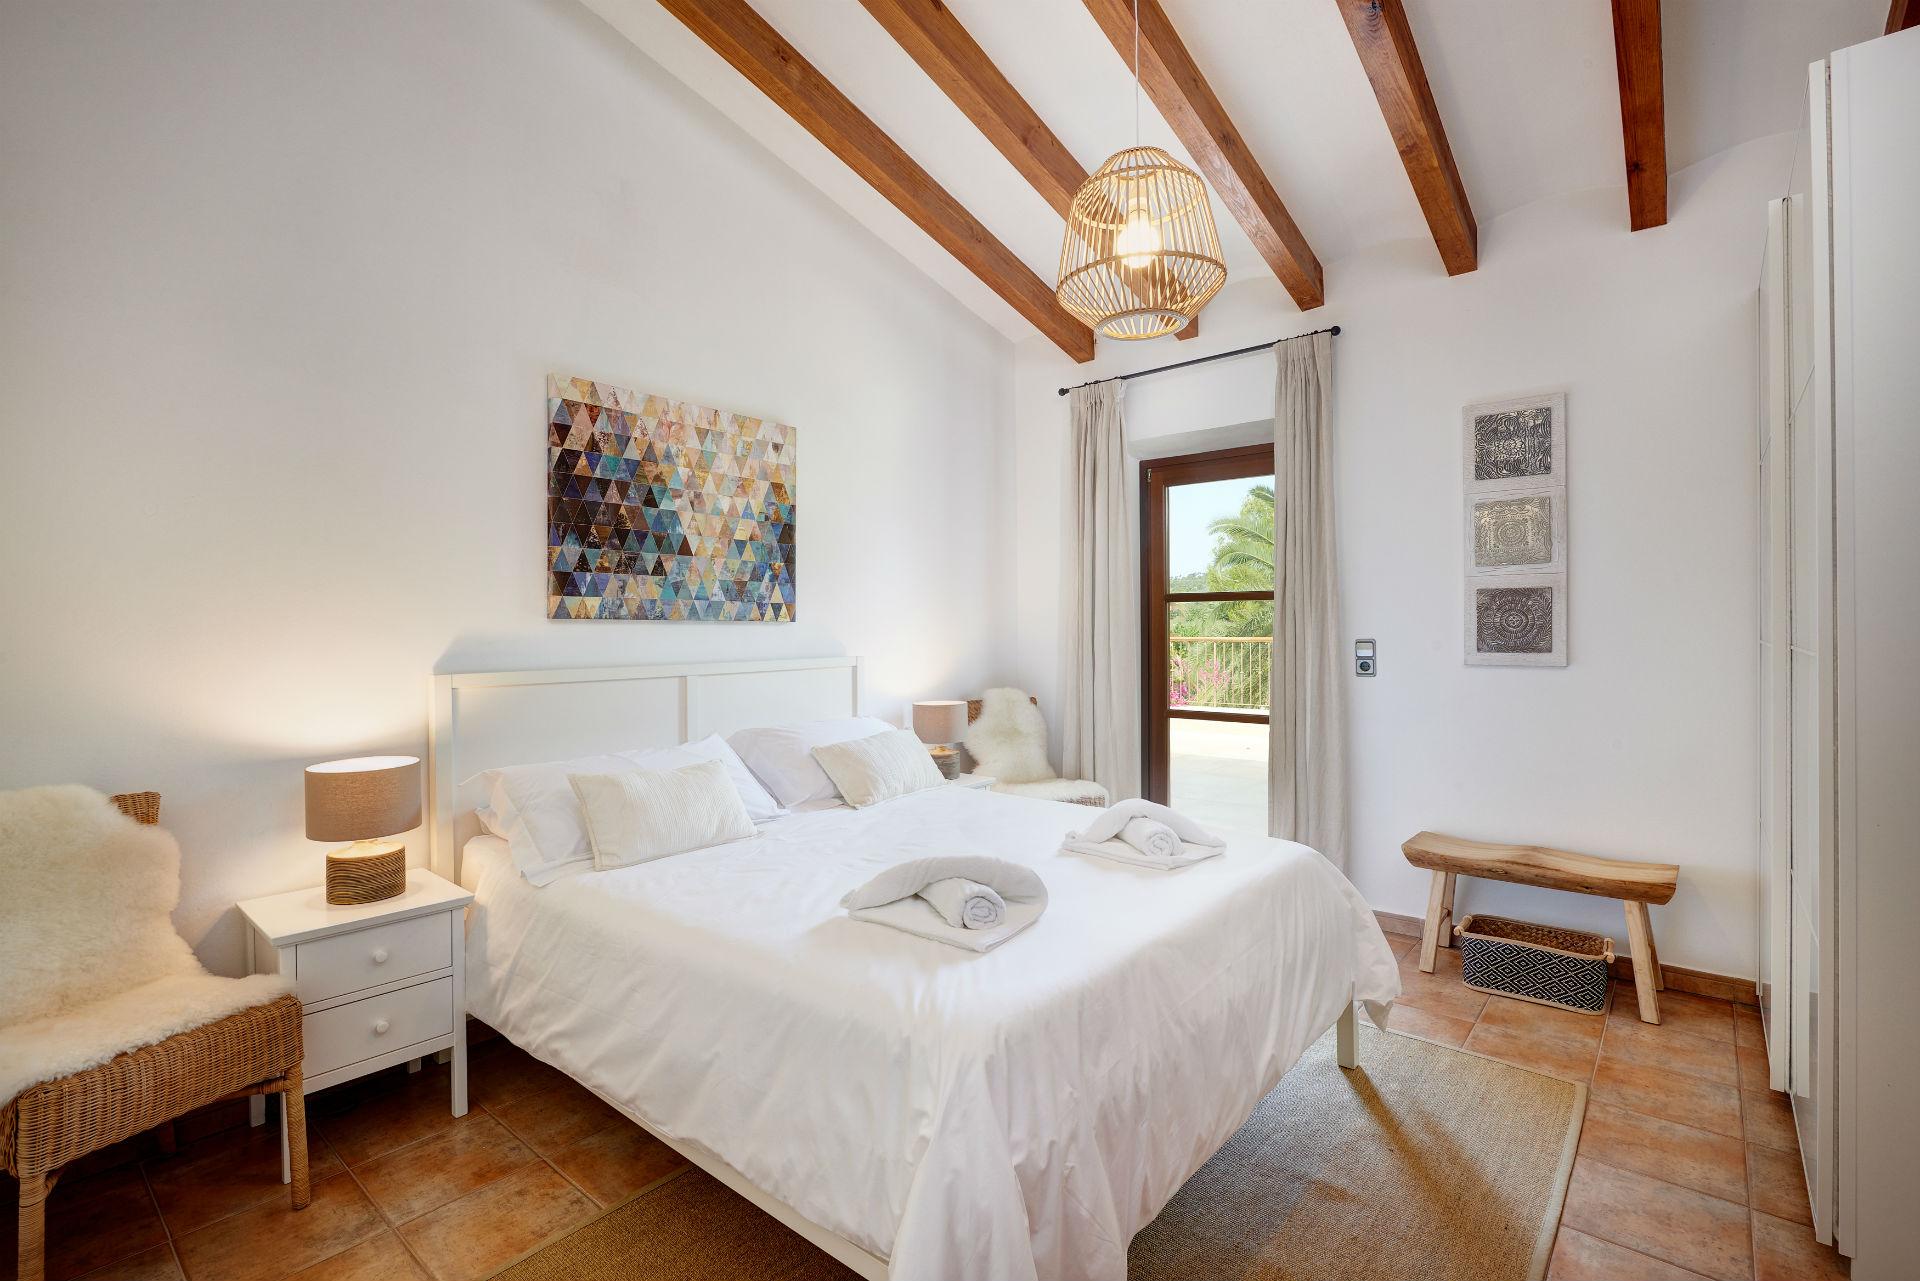 25 Casa Adrover Pollenca Room View 1